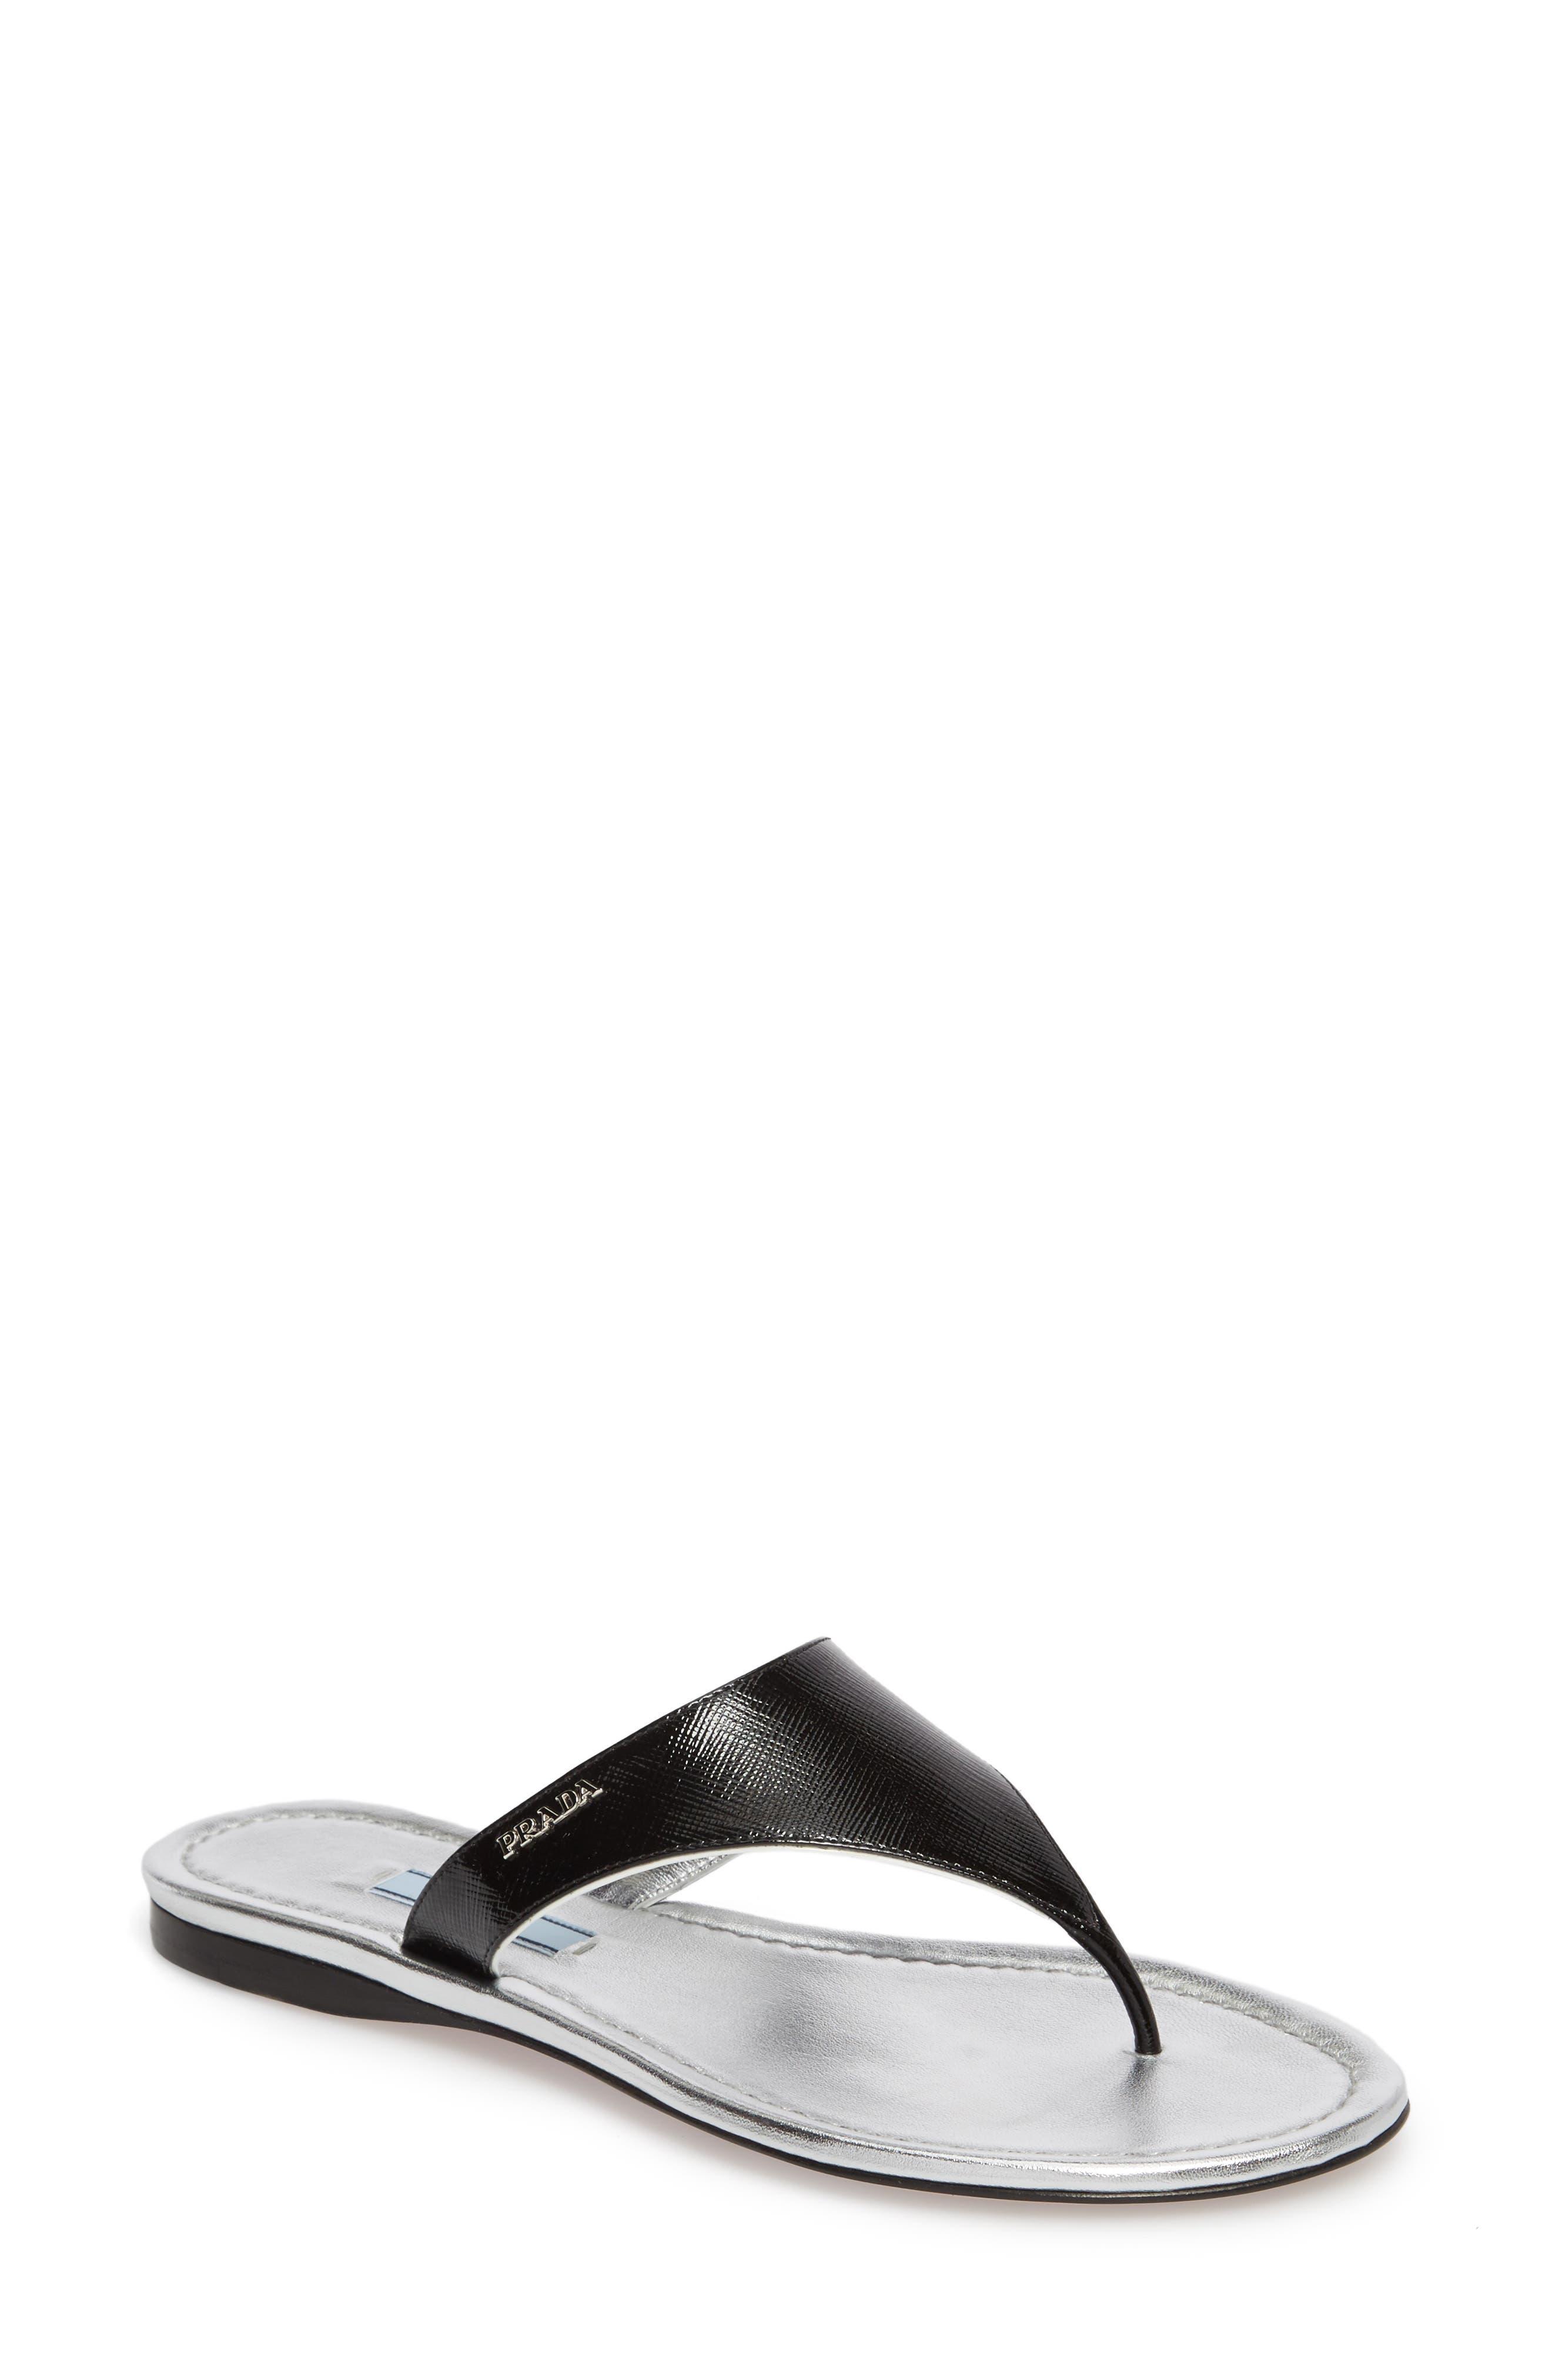 Thong Sandal,                         Main,                         color, 001